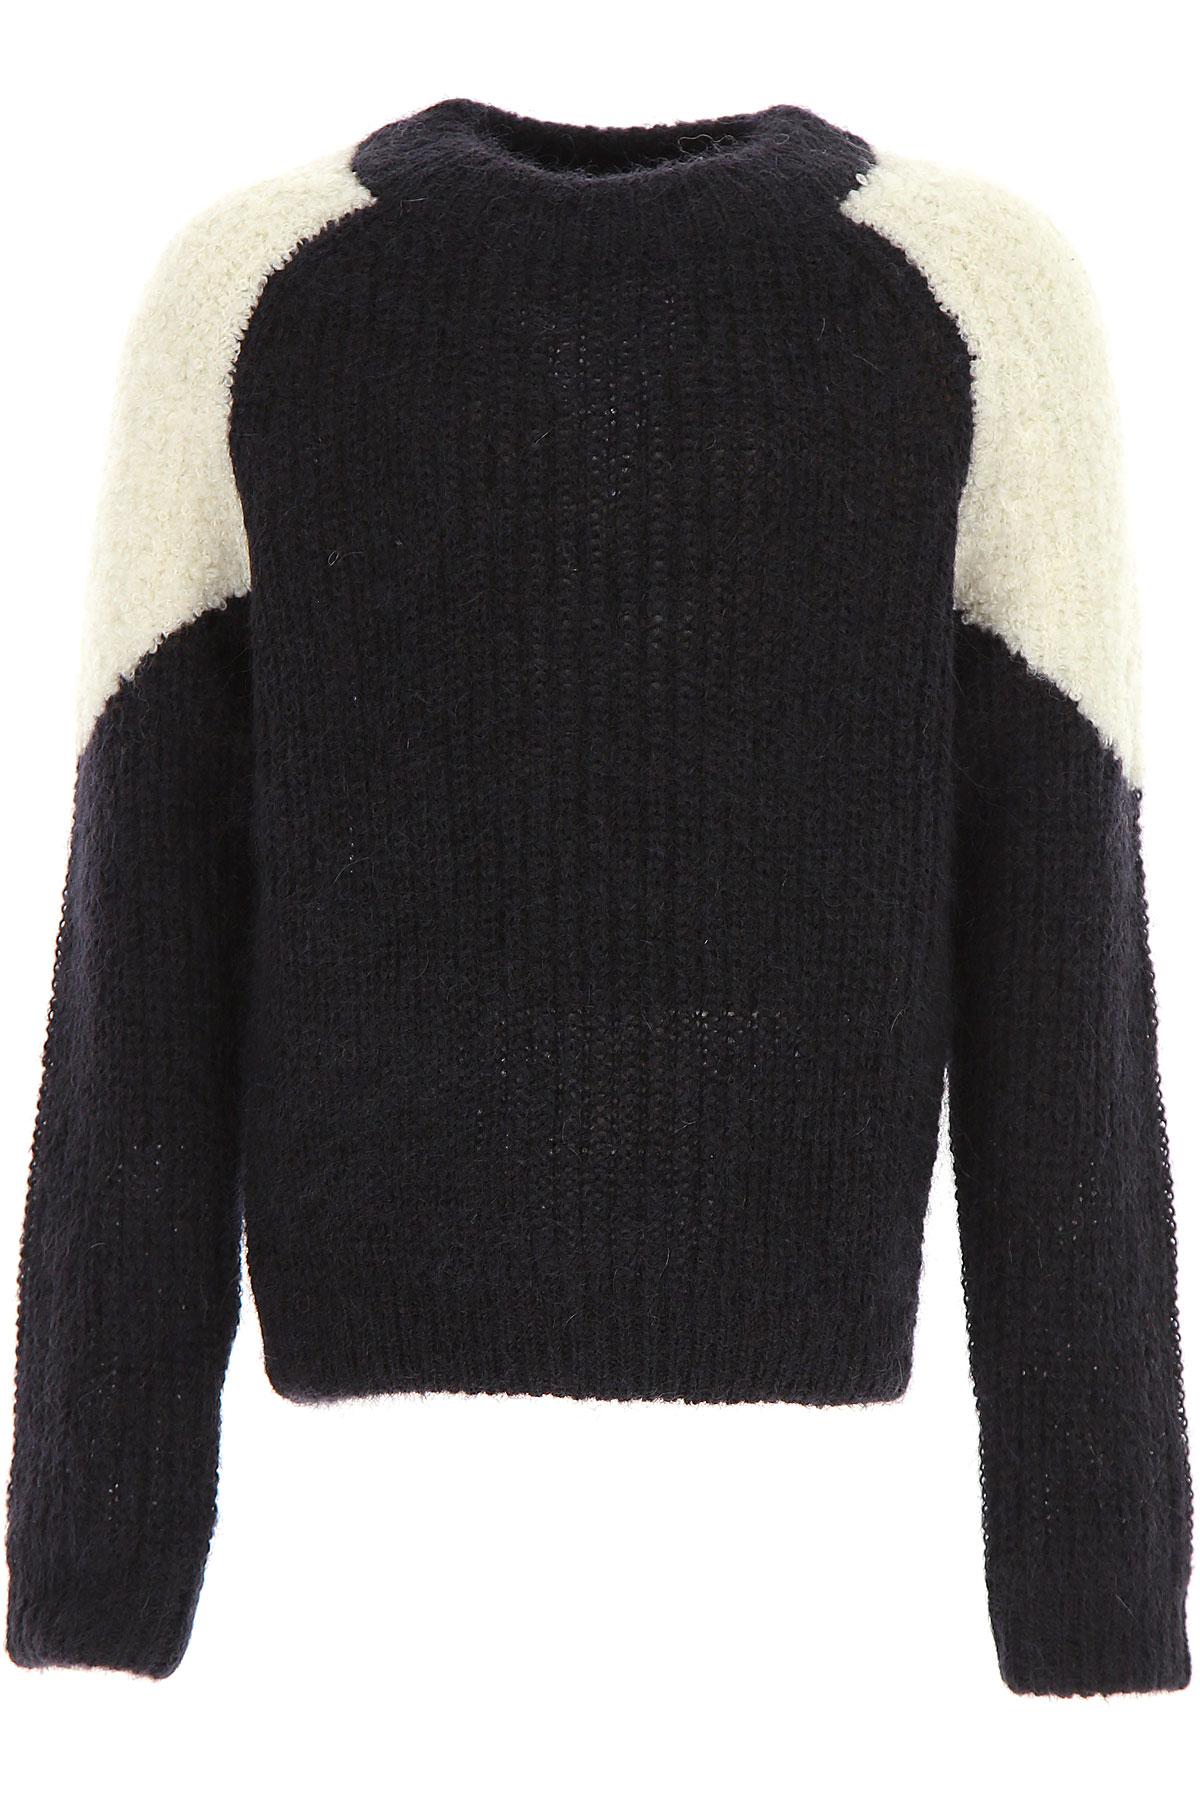 Image of Les Coyotes De Paris Kids Sweaters for Girls, Black, Kid mohair, 2017, 10Y 8Y